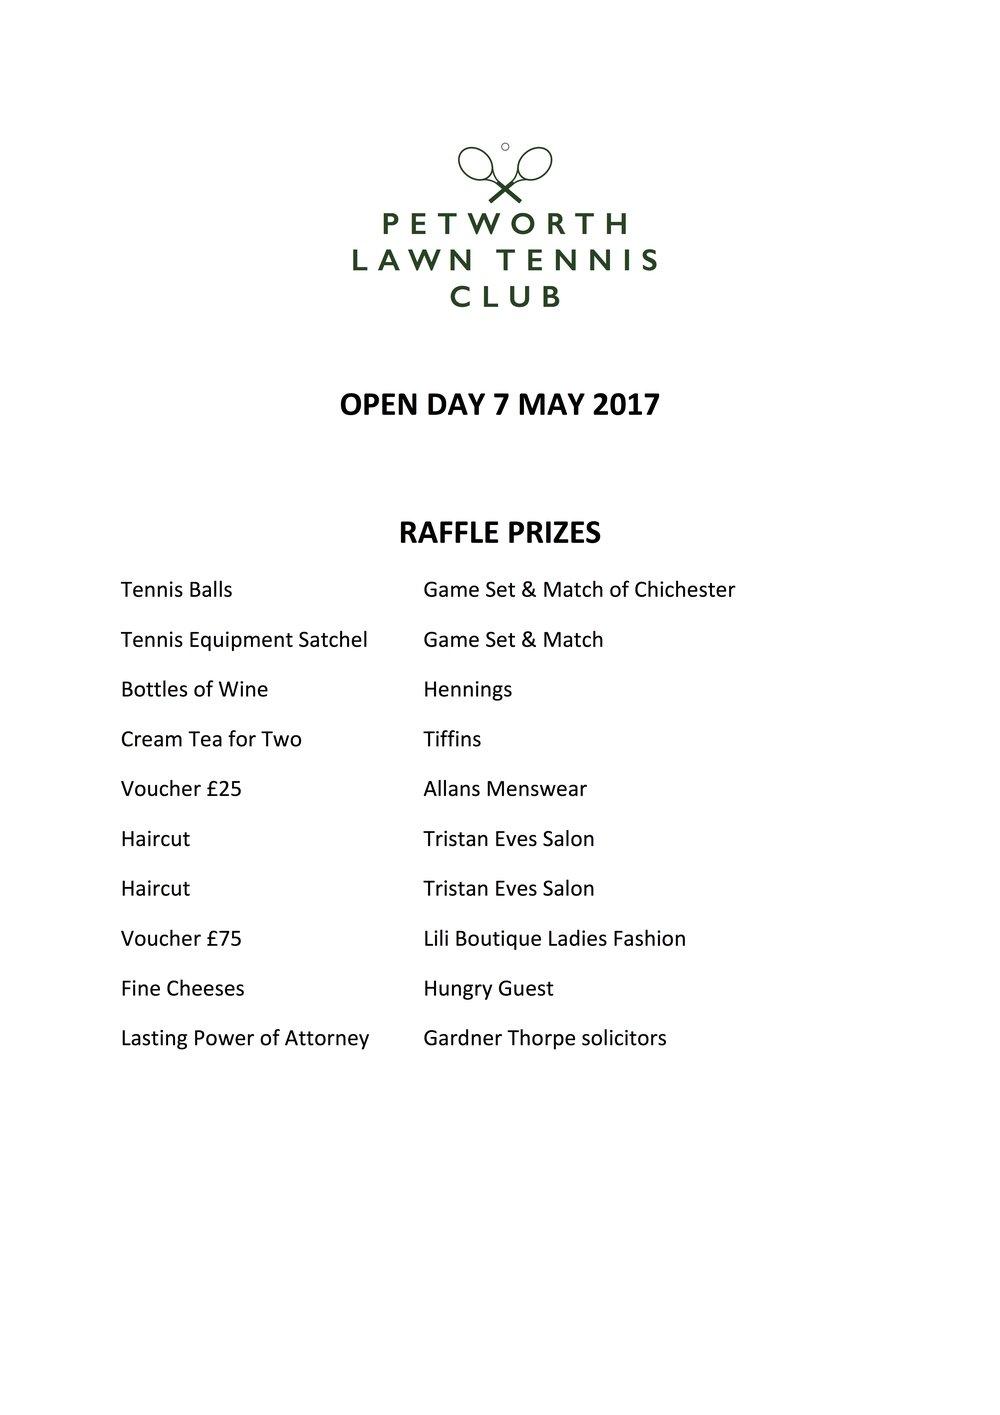 Open Day 2017 Raffle Prizes.jpg